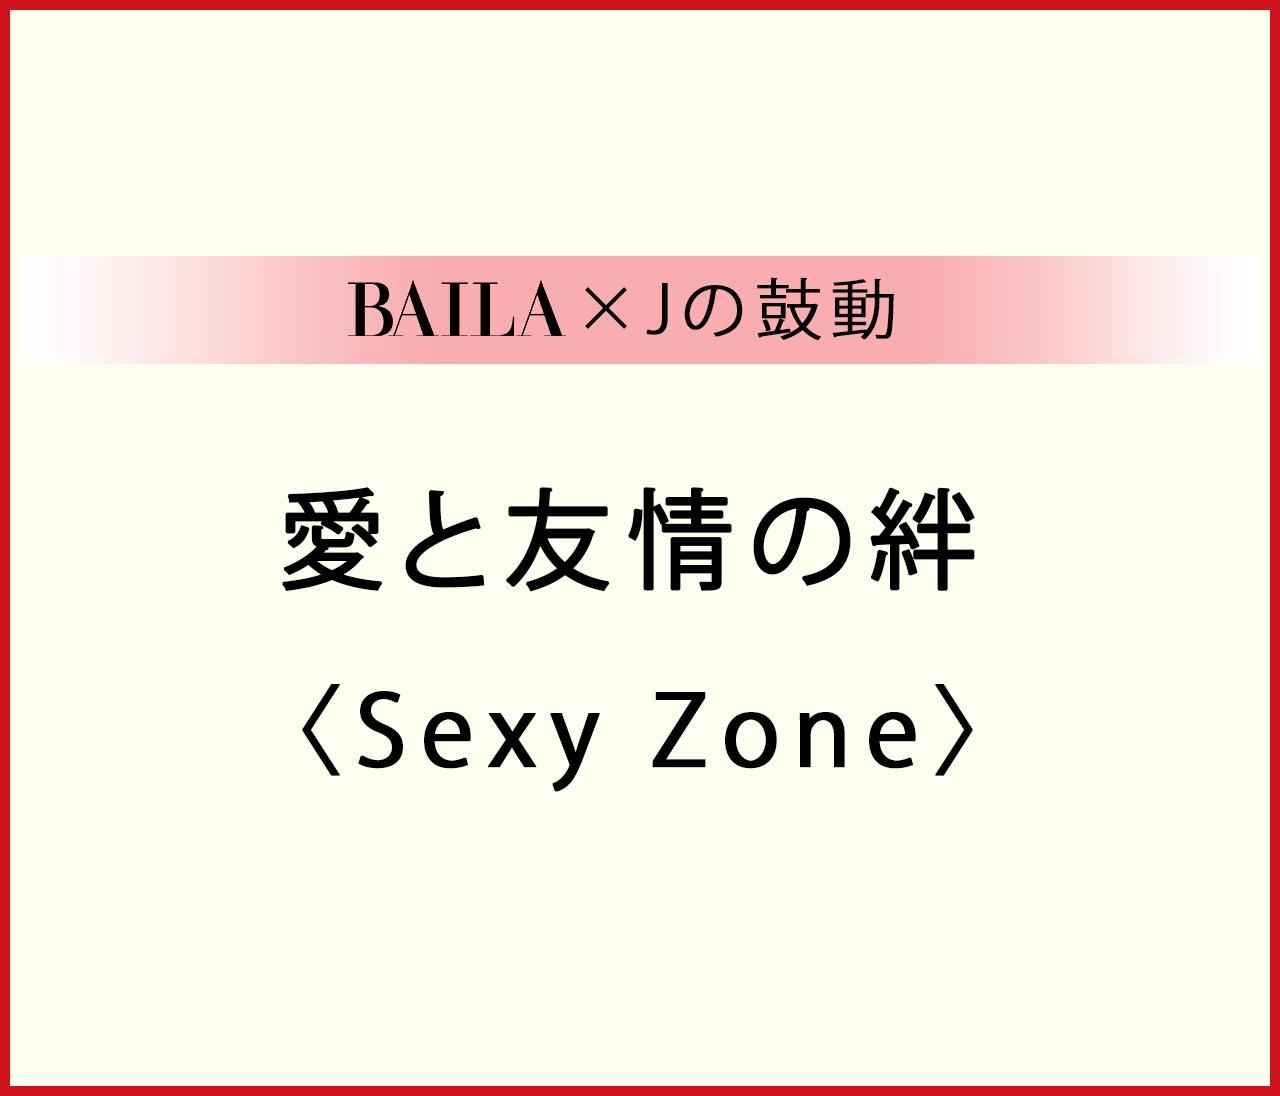 【BAILA × Jの鼓動】Sexy Zoneスペシャルインタビュー!